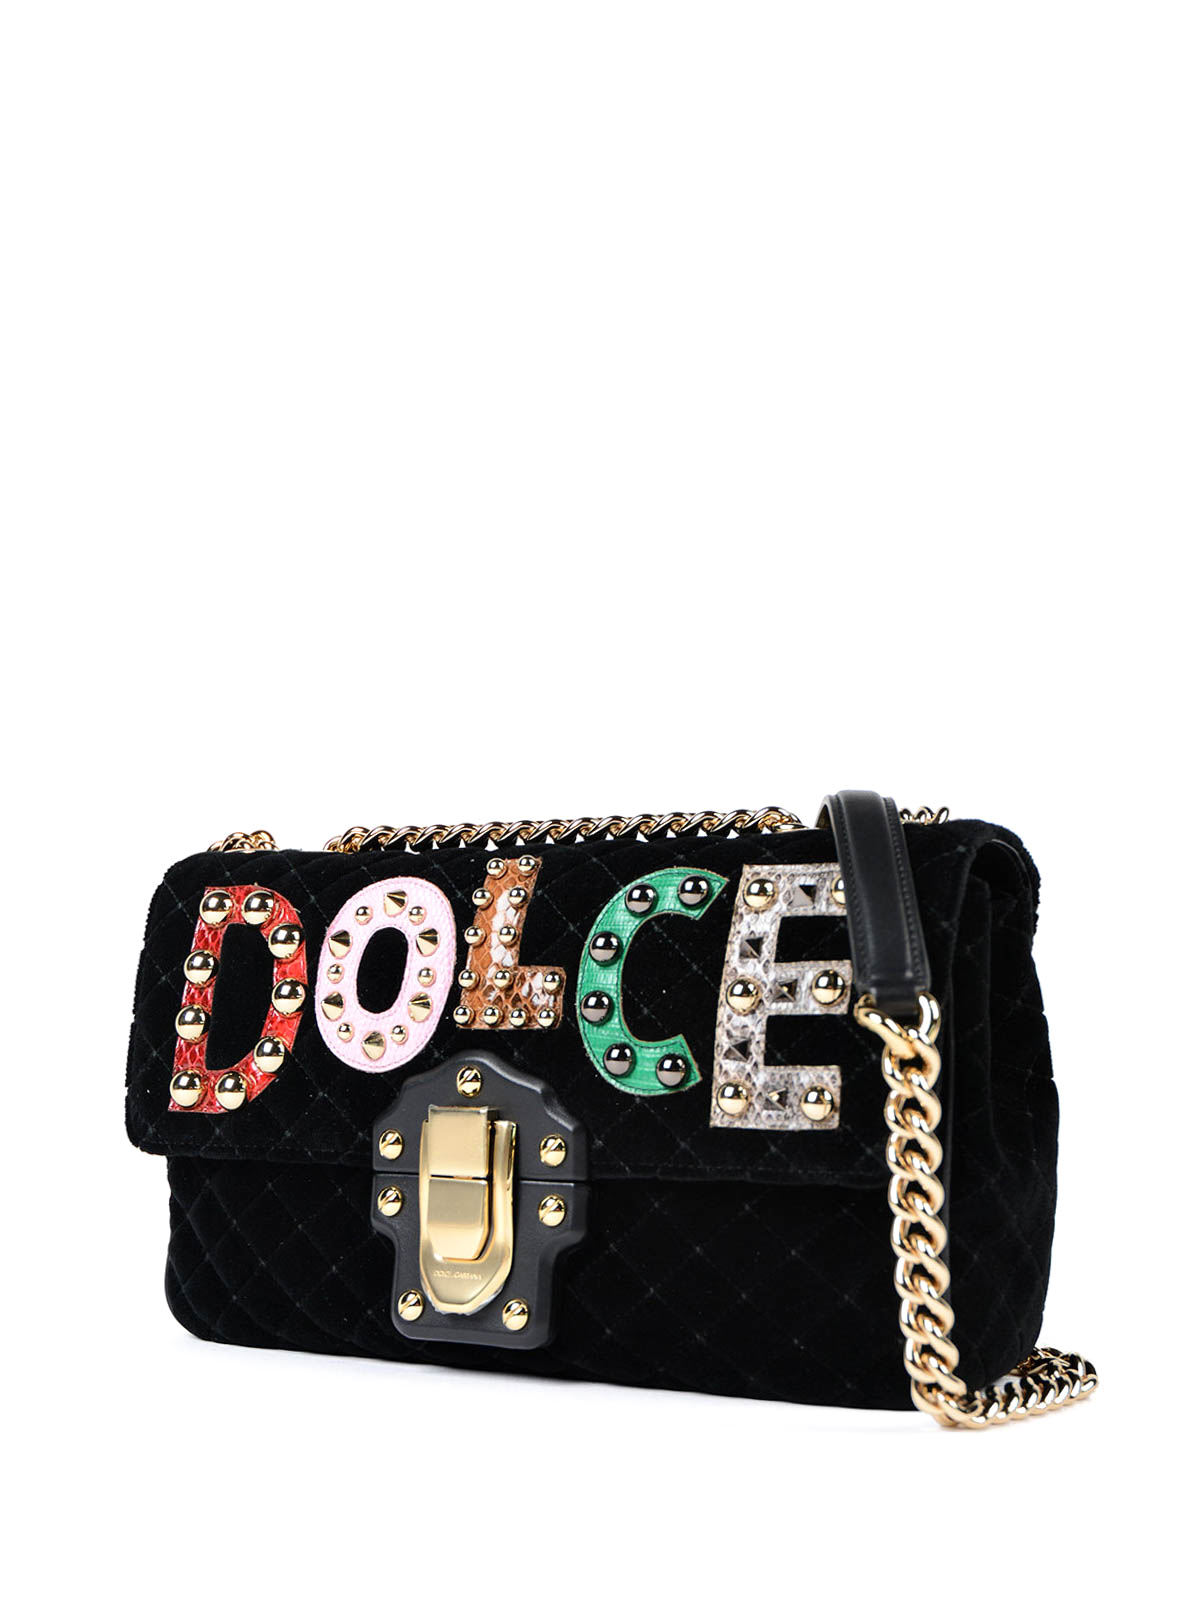 42b4e25031a8 DOLCE   GABBANA  shoulder bags online - Lucia quilted velvet bag